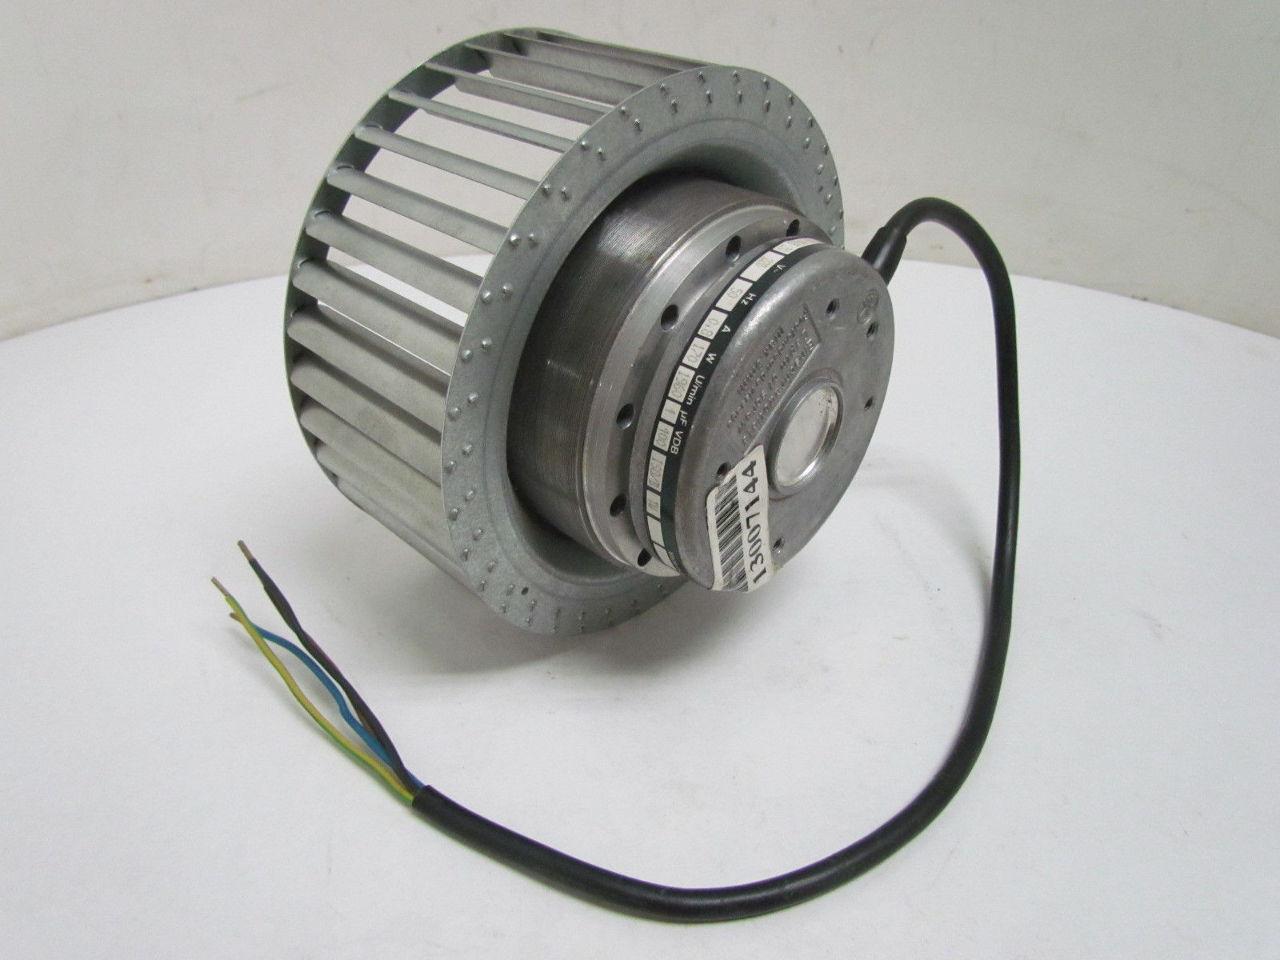 R2E140 AC05 20 220V 50 Hz 8A 170W Centrifugal Blower Fan New eBay #404A60